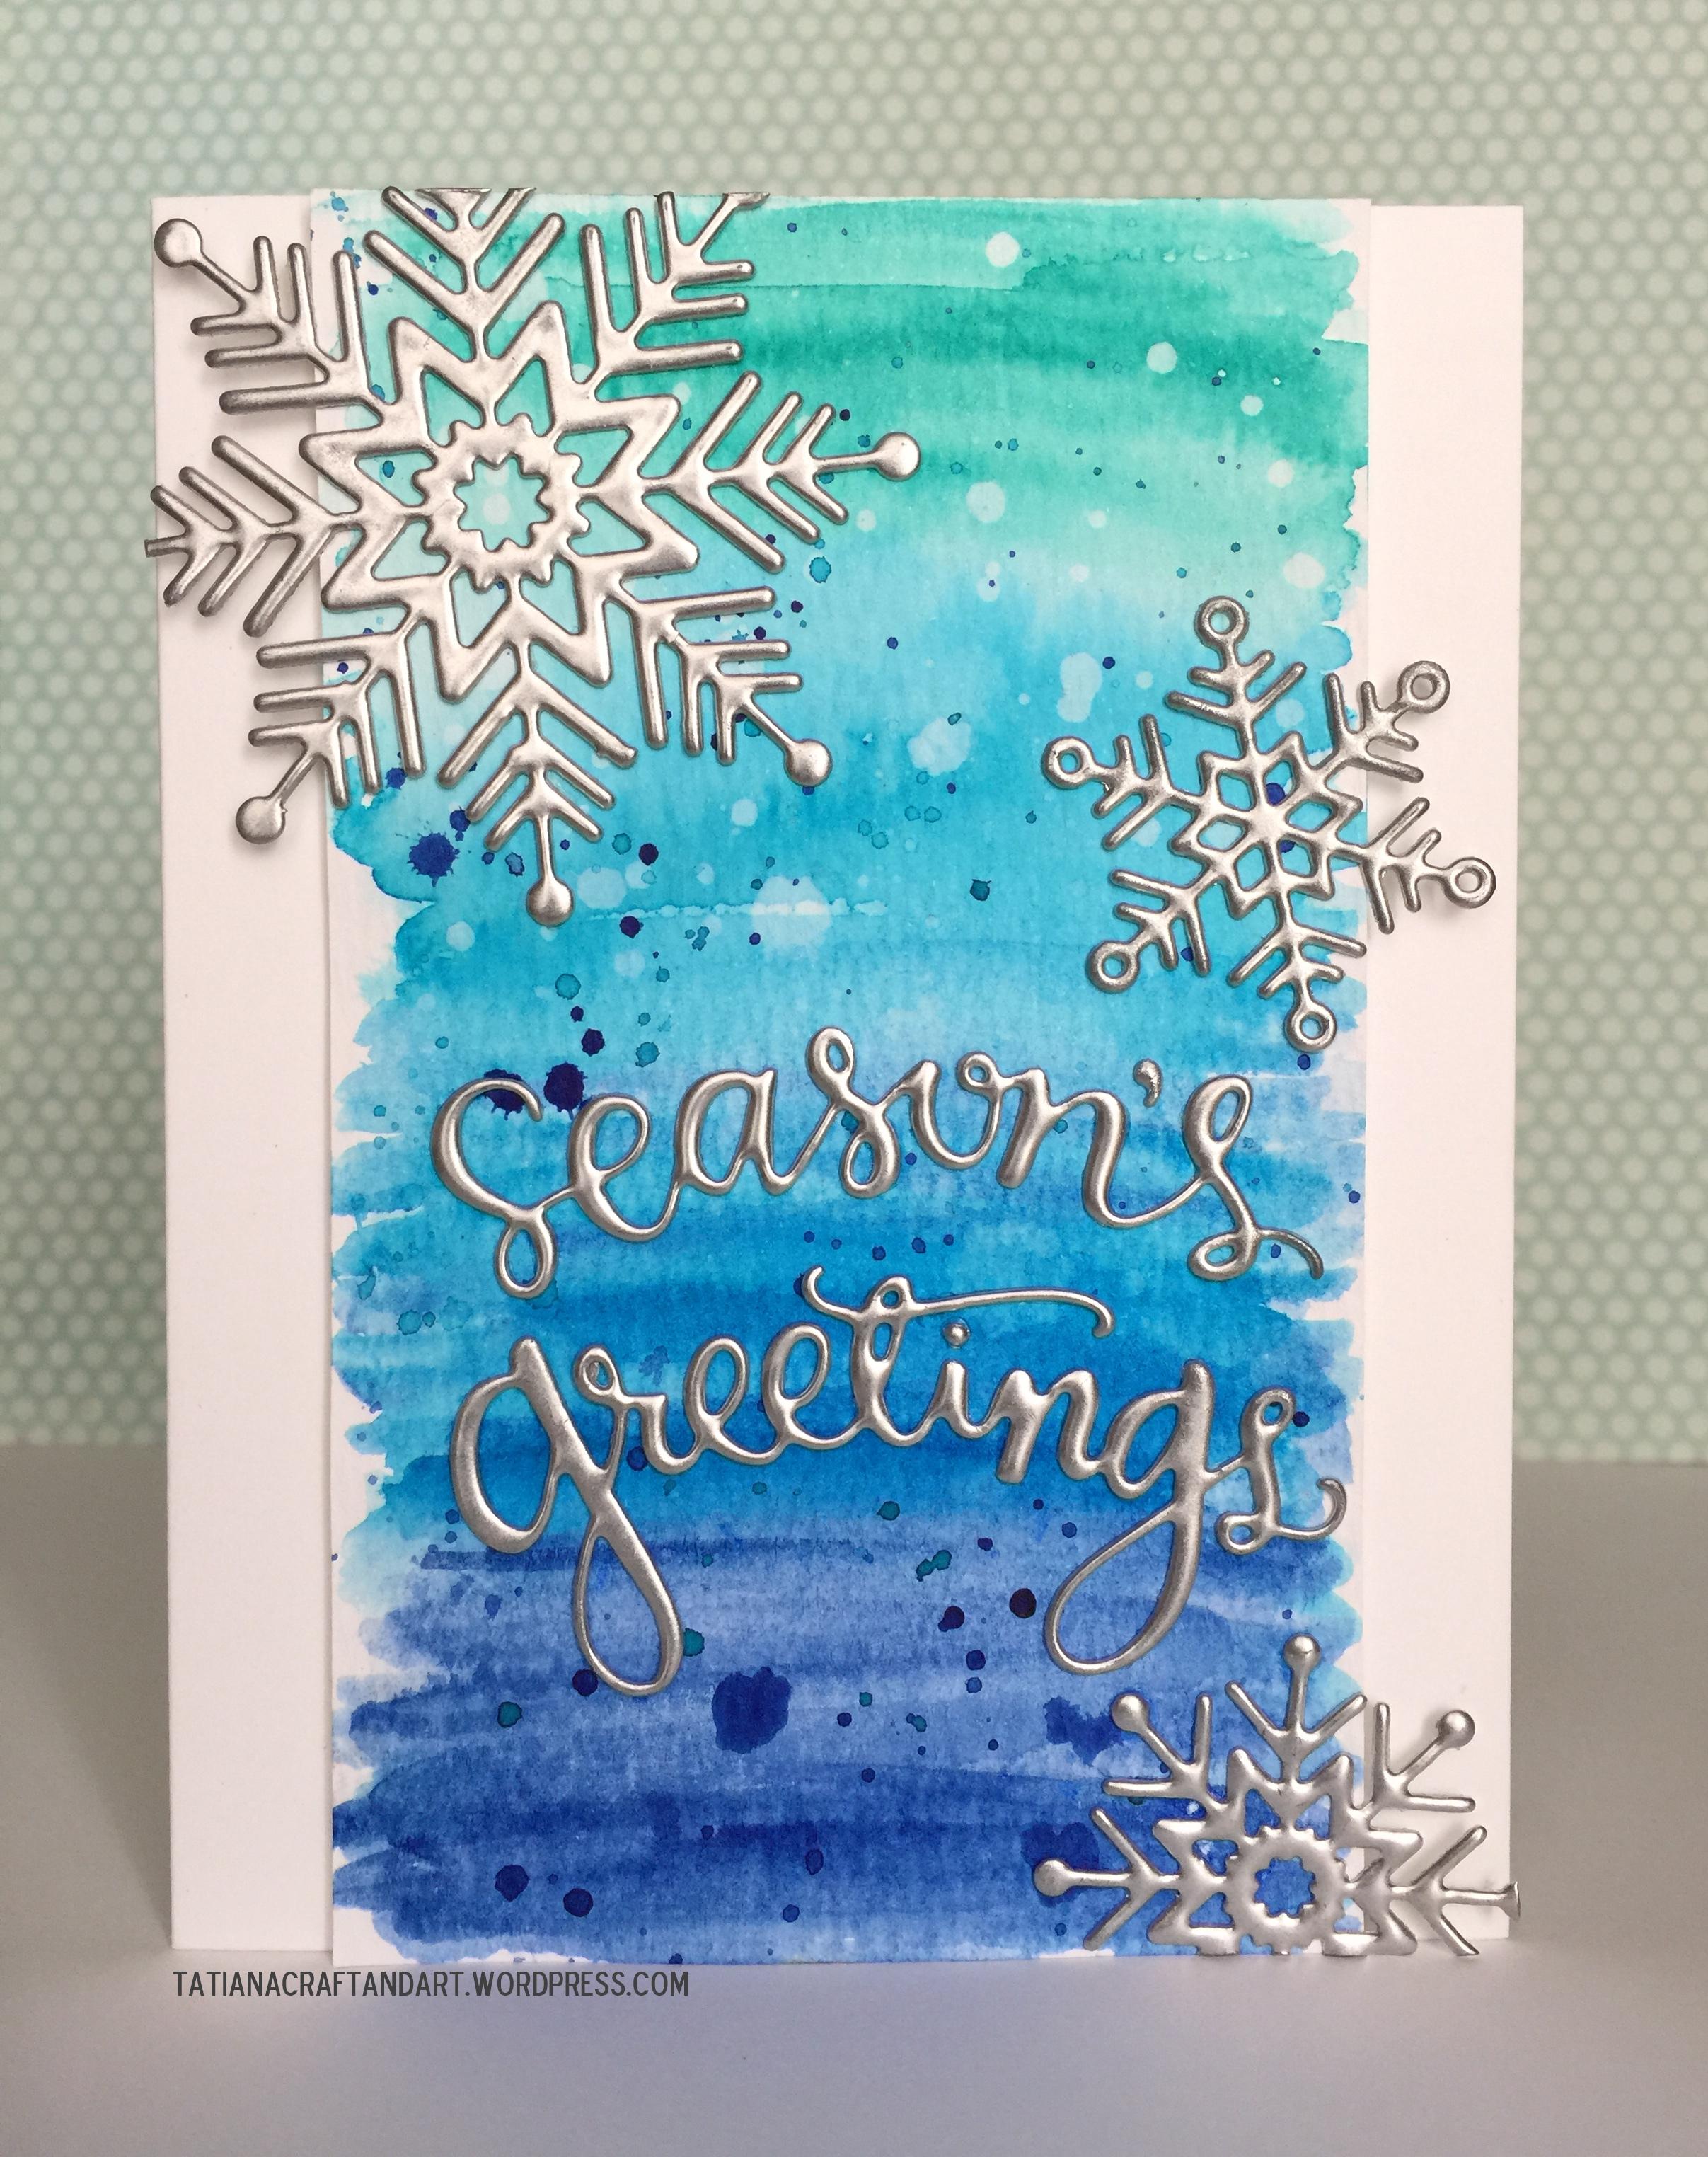 Season's Greetings 2015 (1)